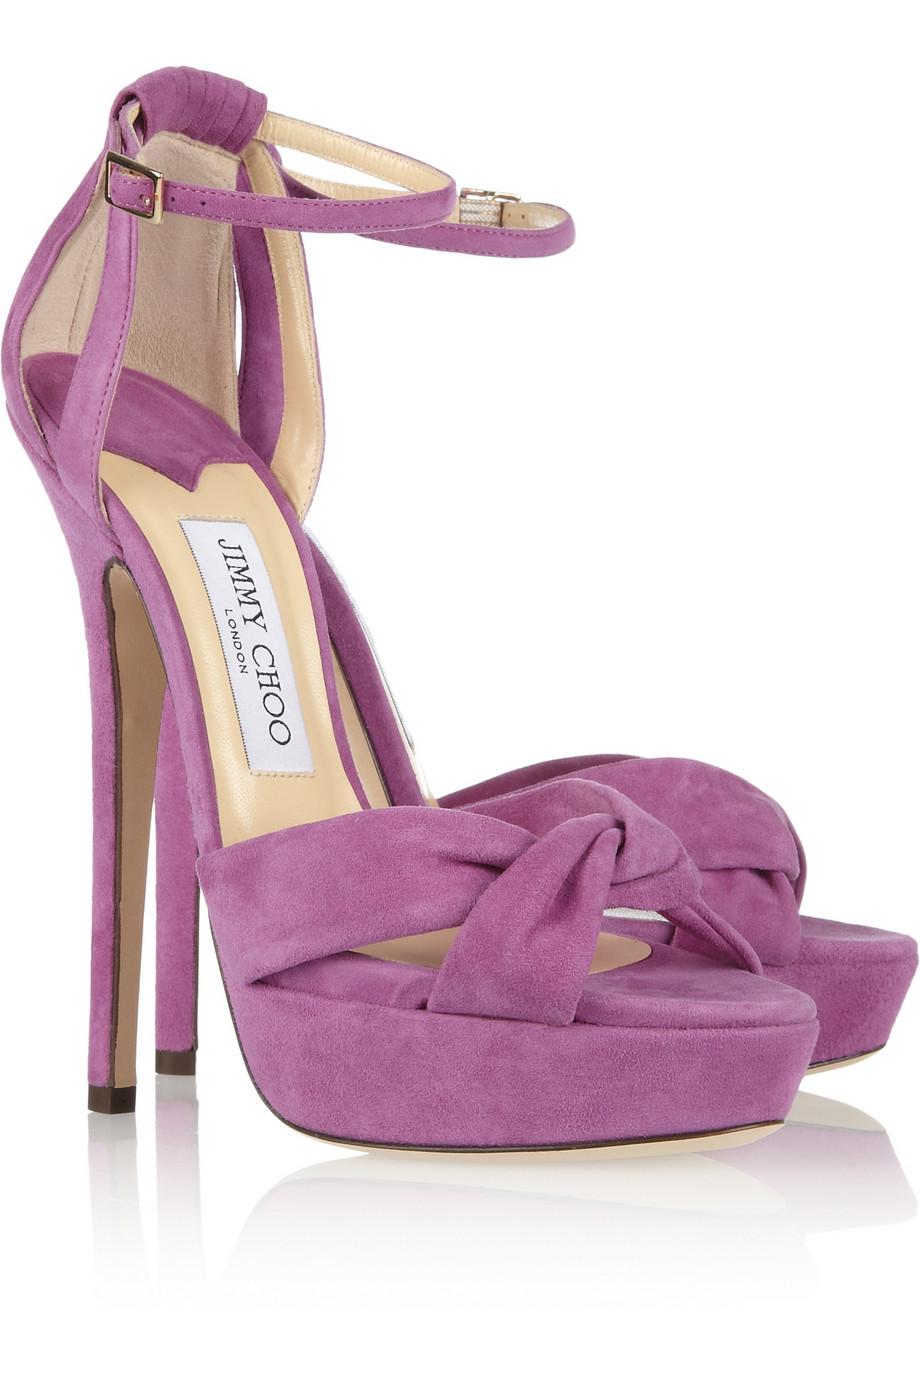 42a00b00092 Lyst - Jimmy Choo Greta Suede Sandals in Purple